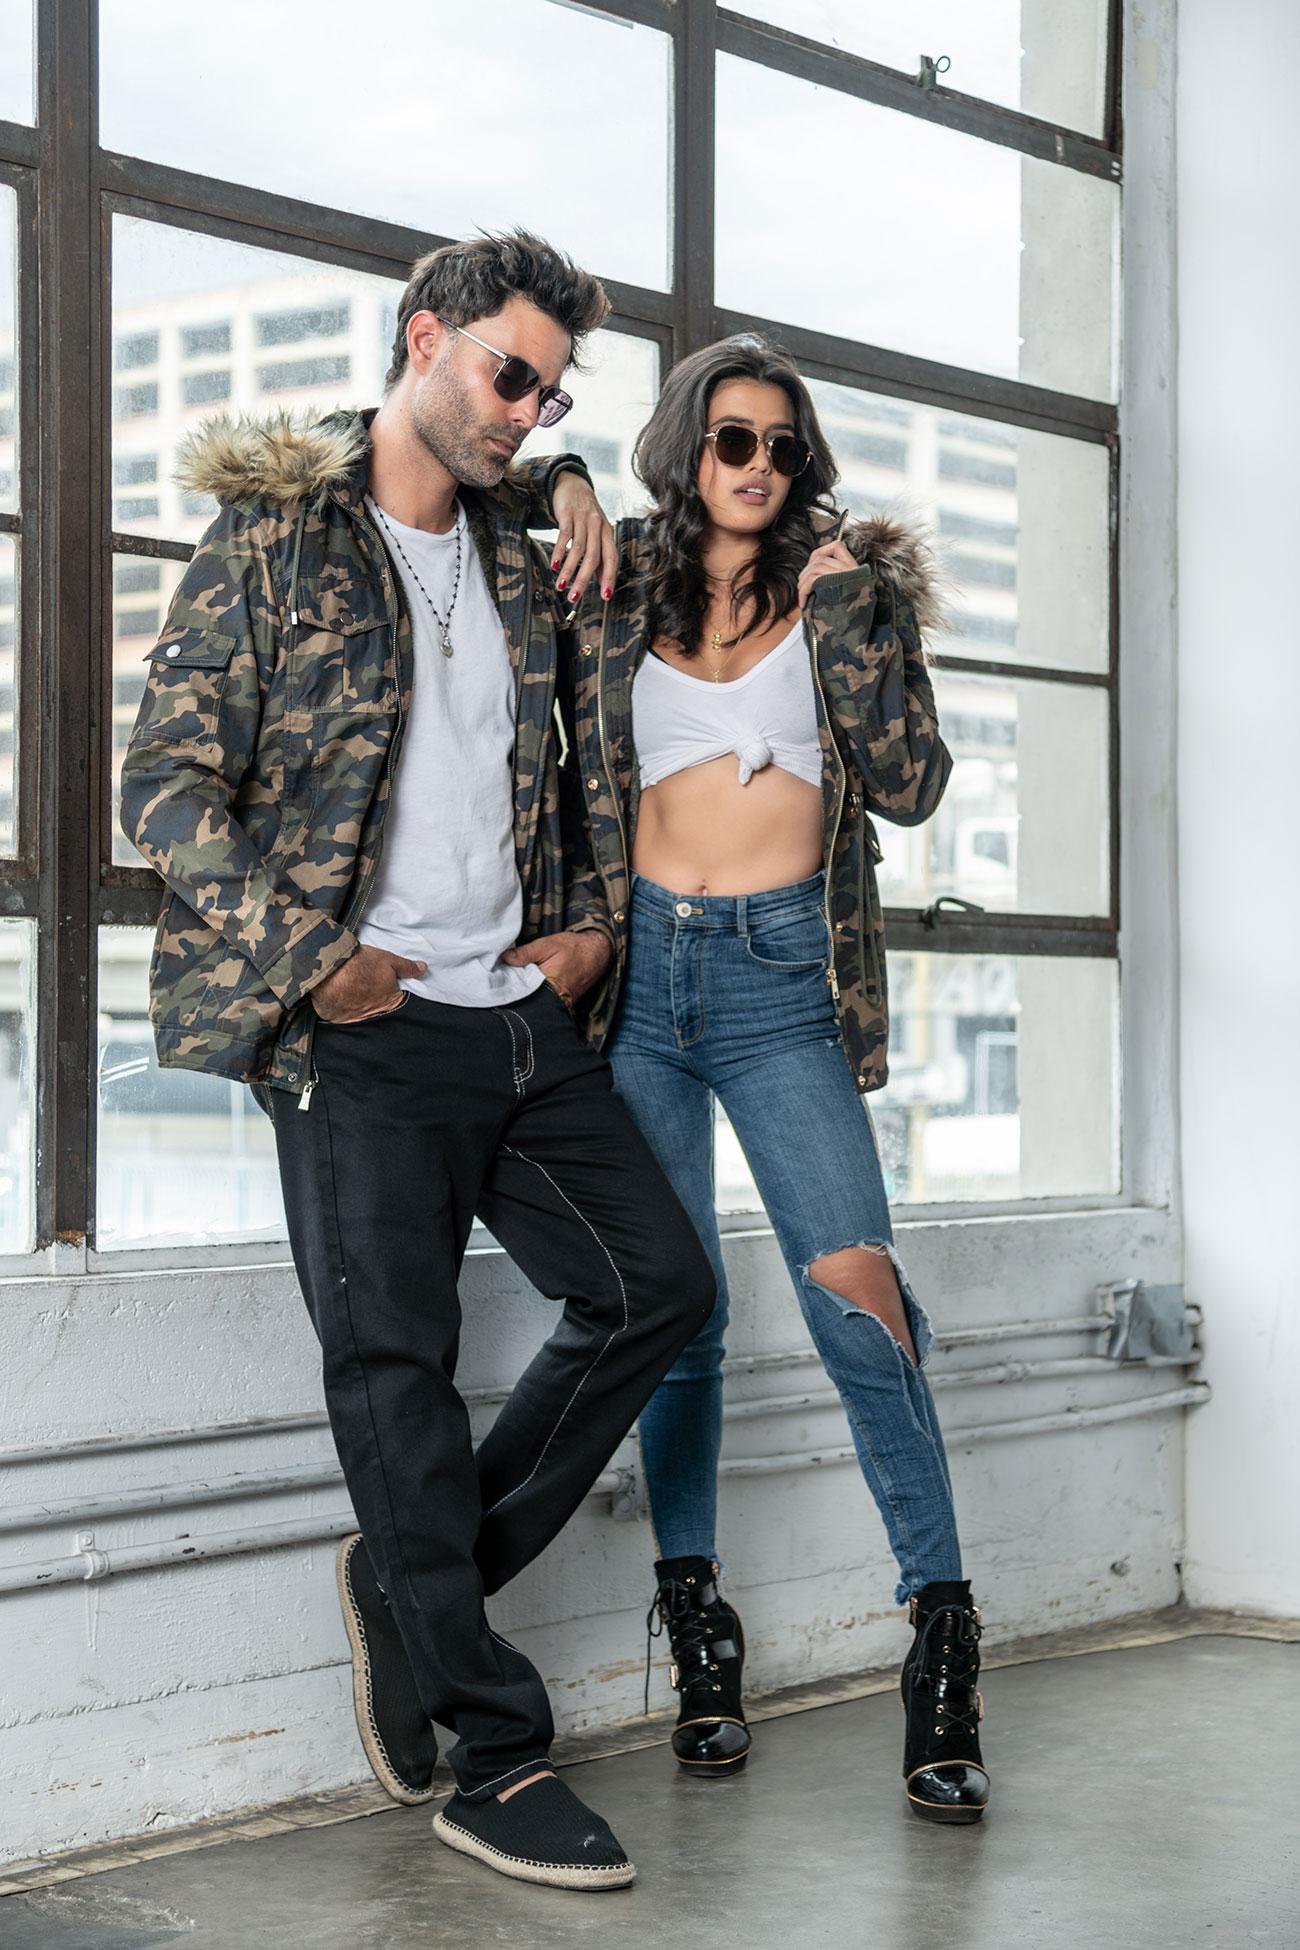 Lifestyle Fashion Photography Eraser Studio Los Angeles